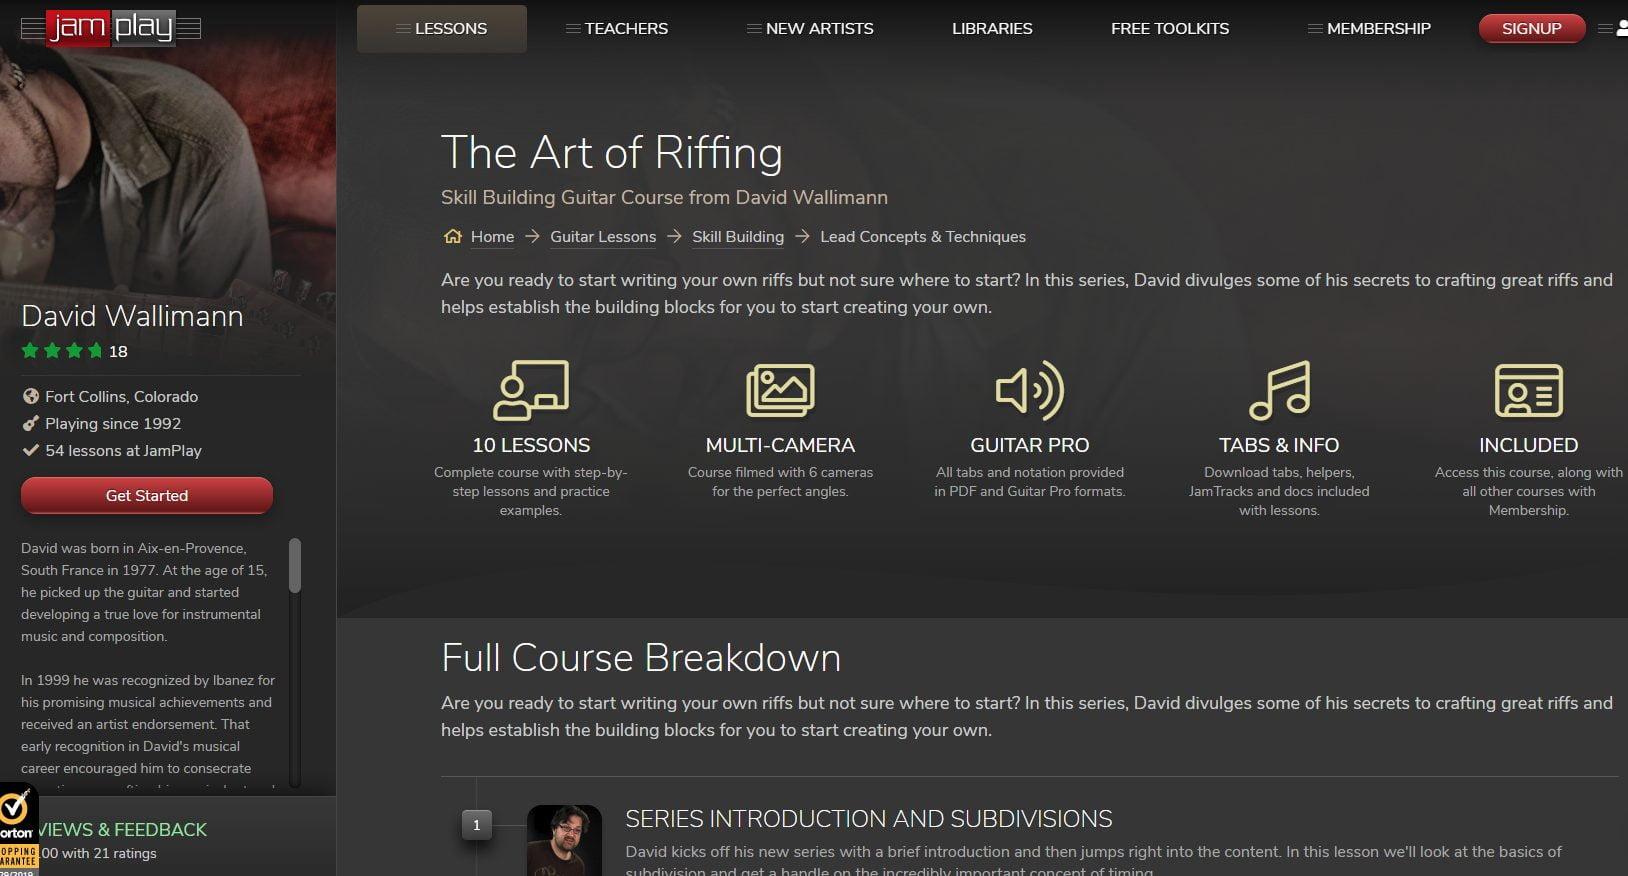 JamPlay - The Art of Riffing Screenshot